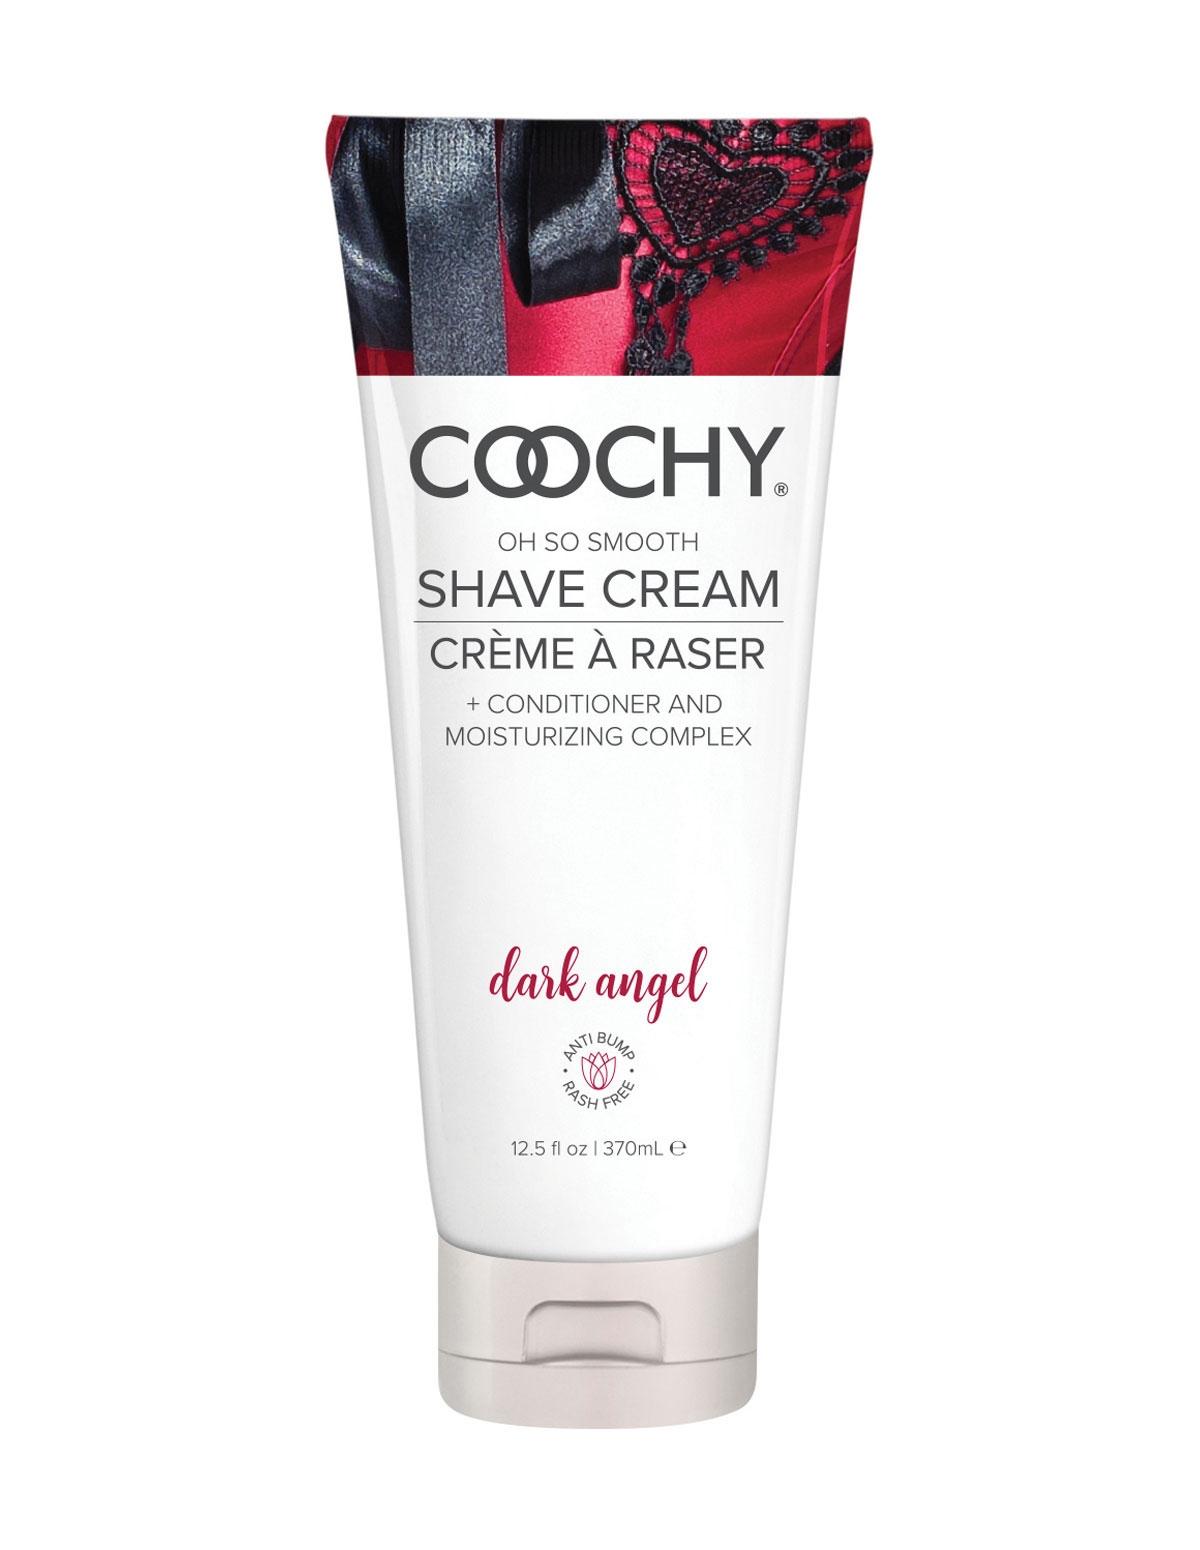 Coochy Shave Cream - Dark Angel